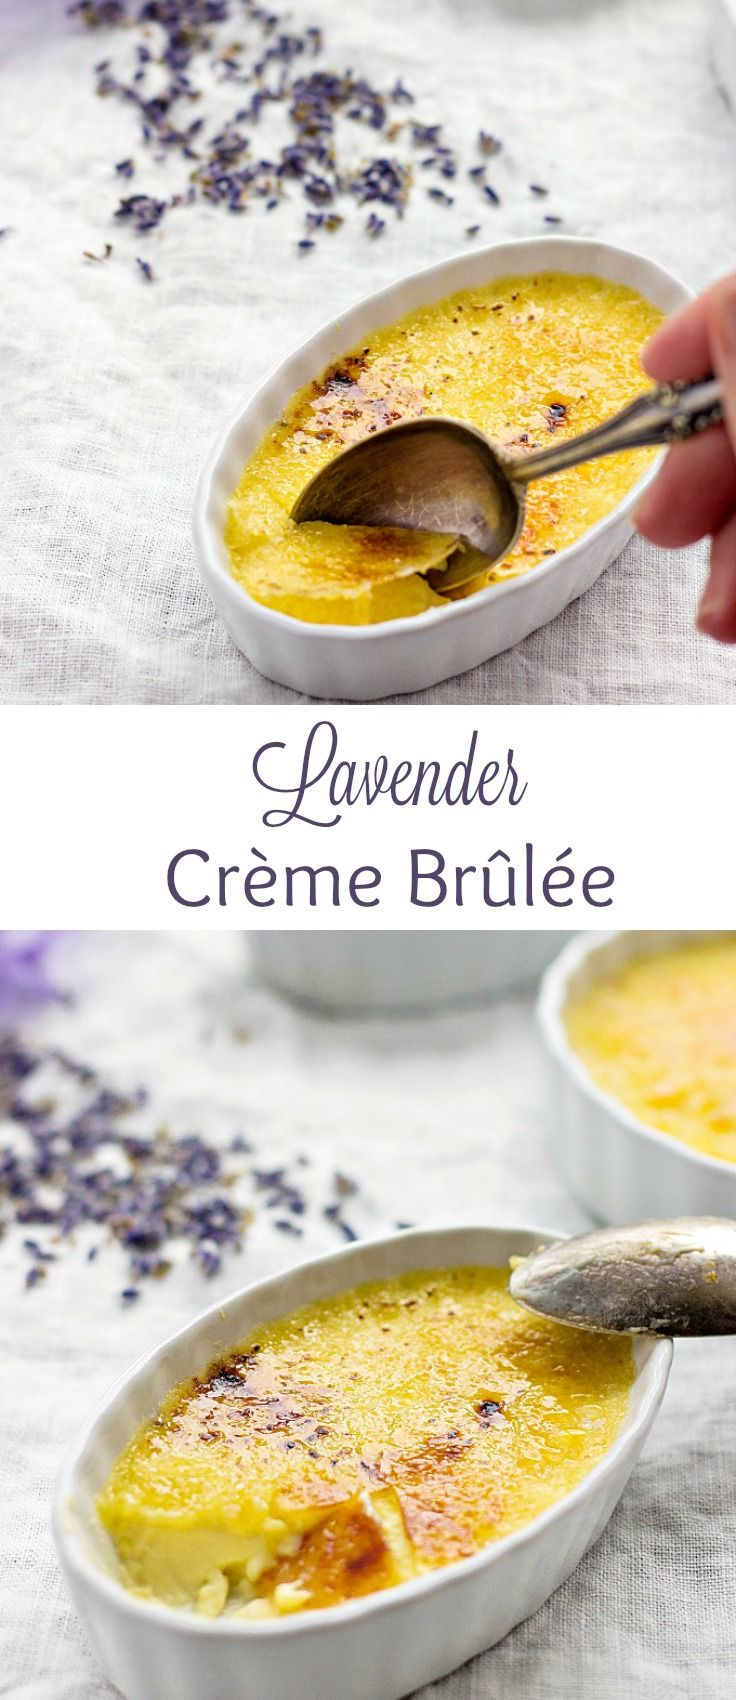 easy dessert   New Year's Eve dessert   creme brulee recipe   lavender desserts